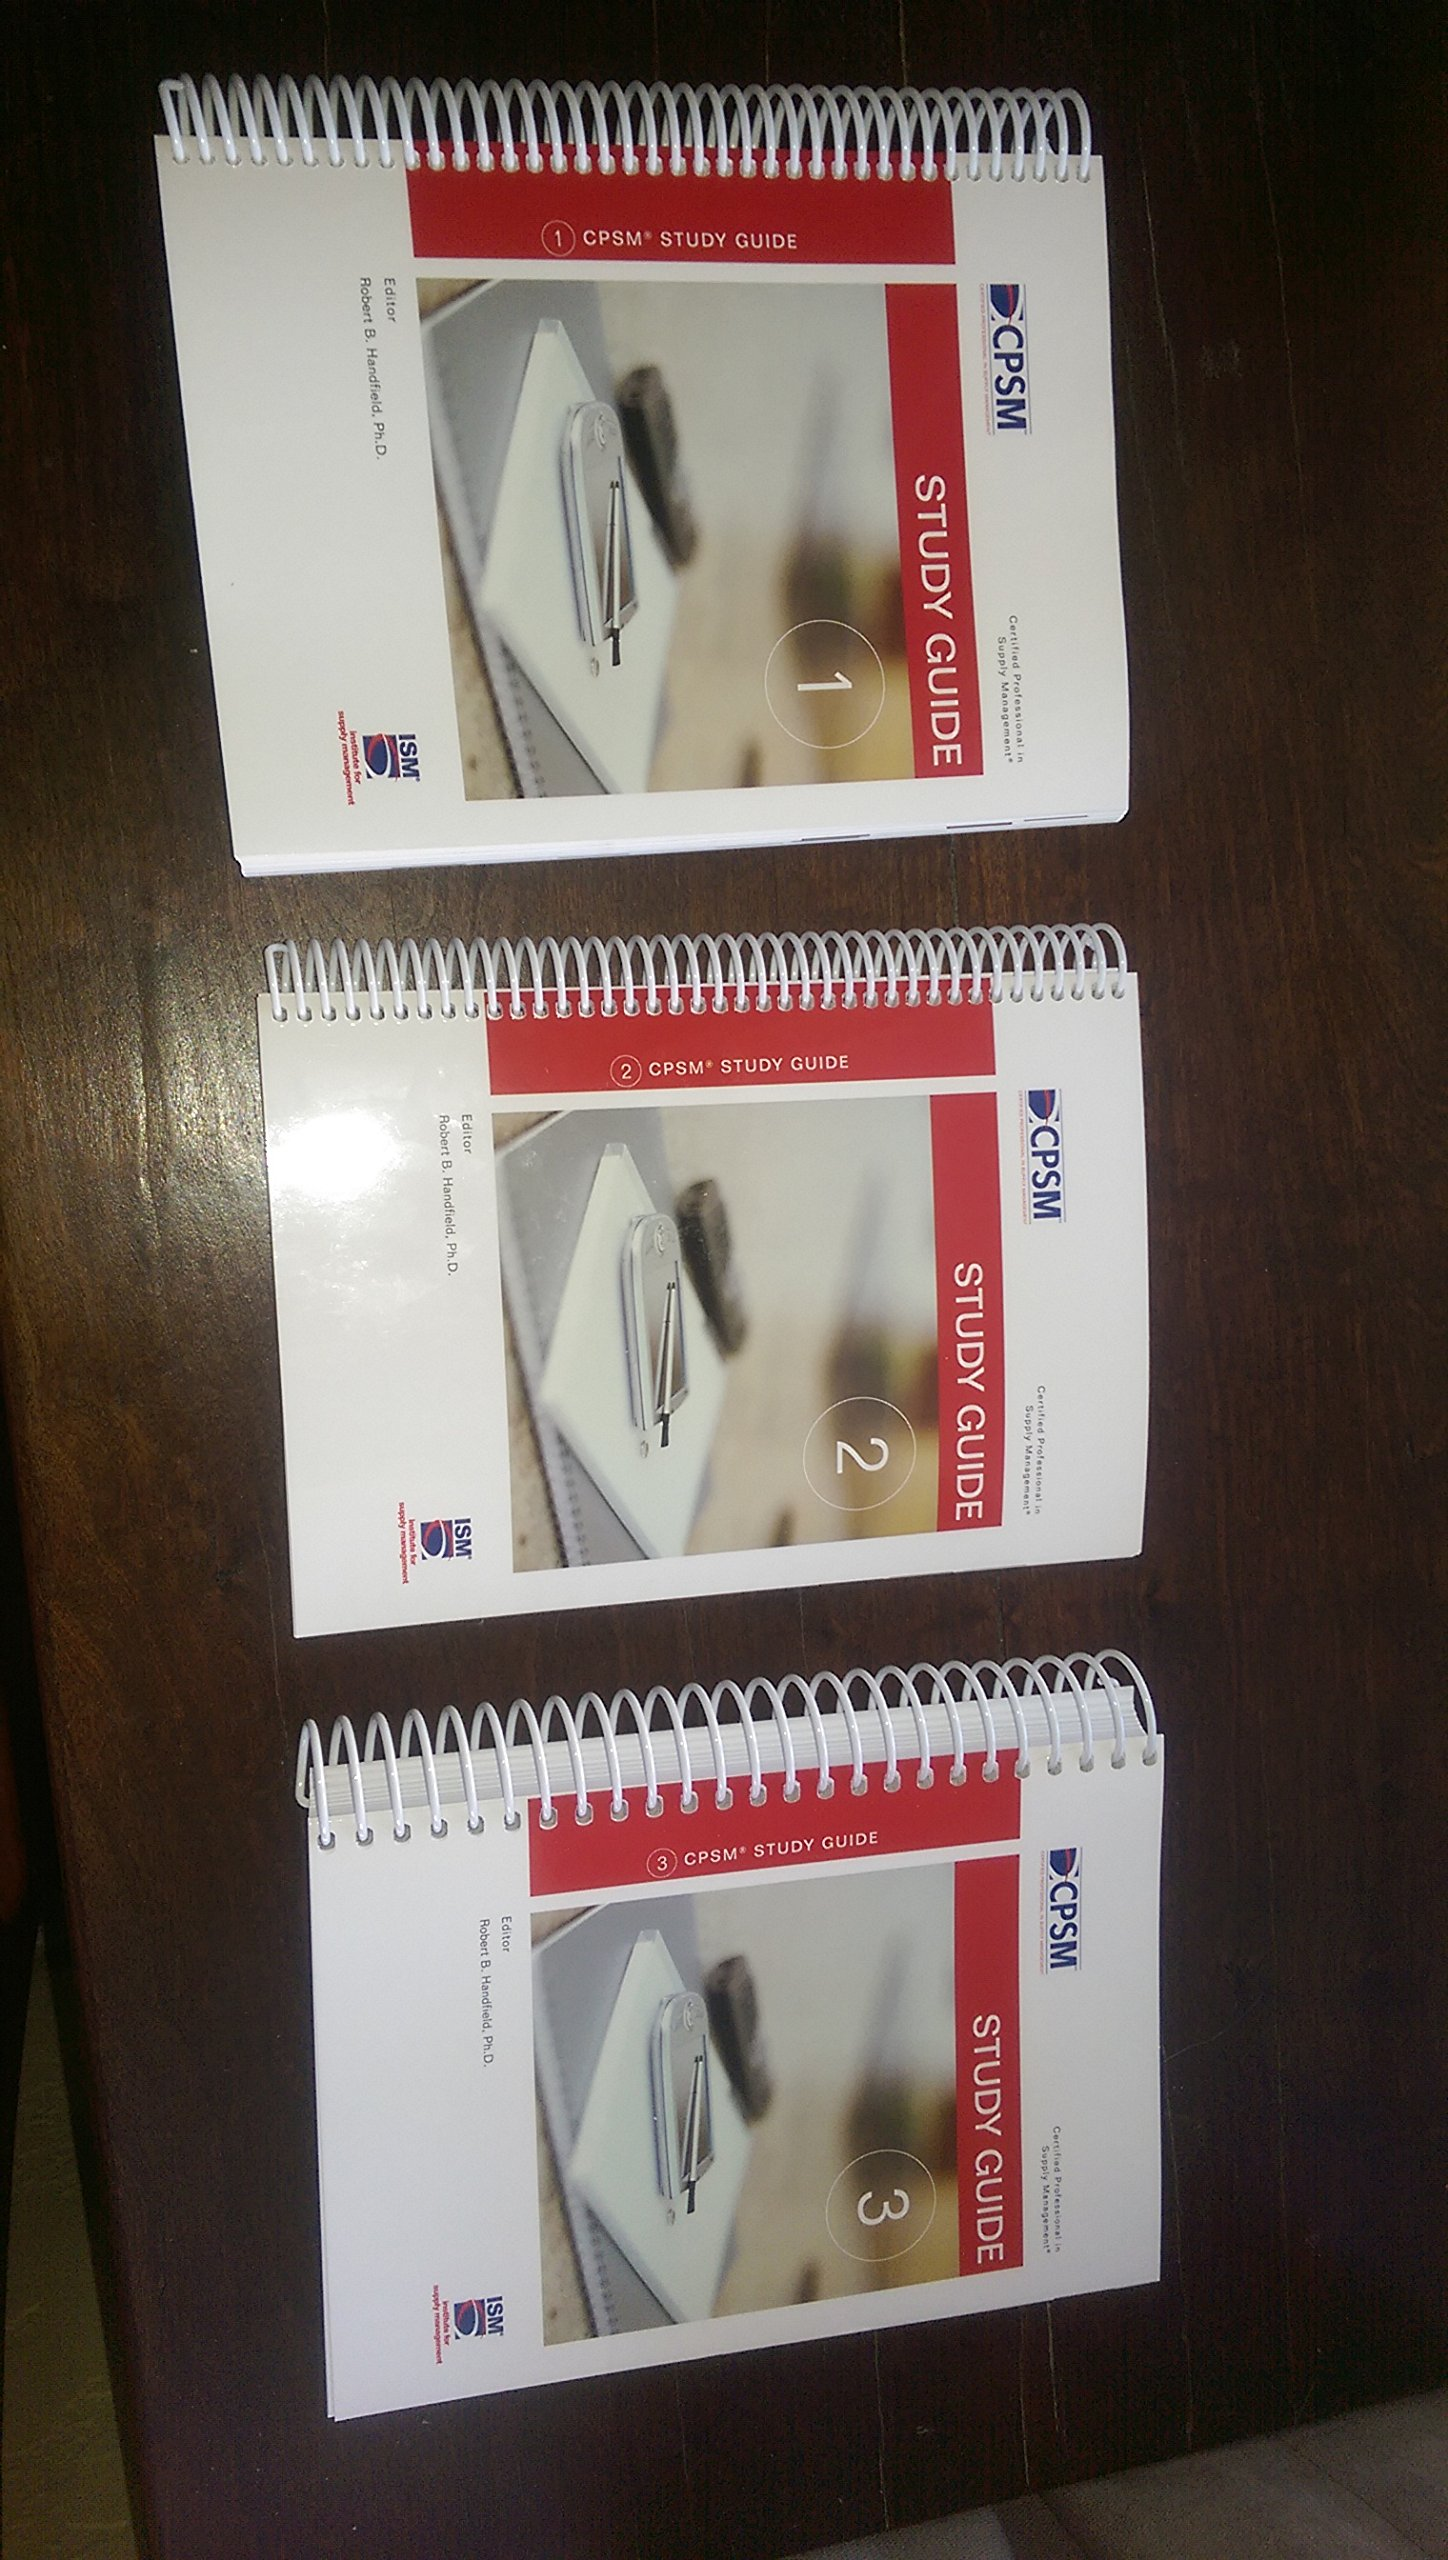 Cpsm Study Guide 3 Volume Set Robert B Handfield Amazon Books